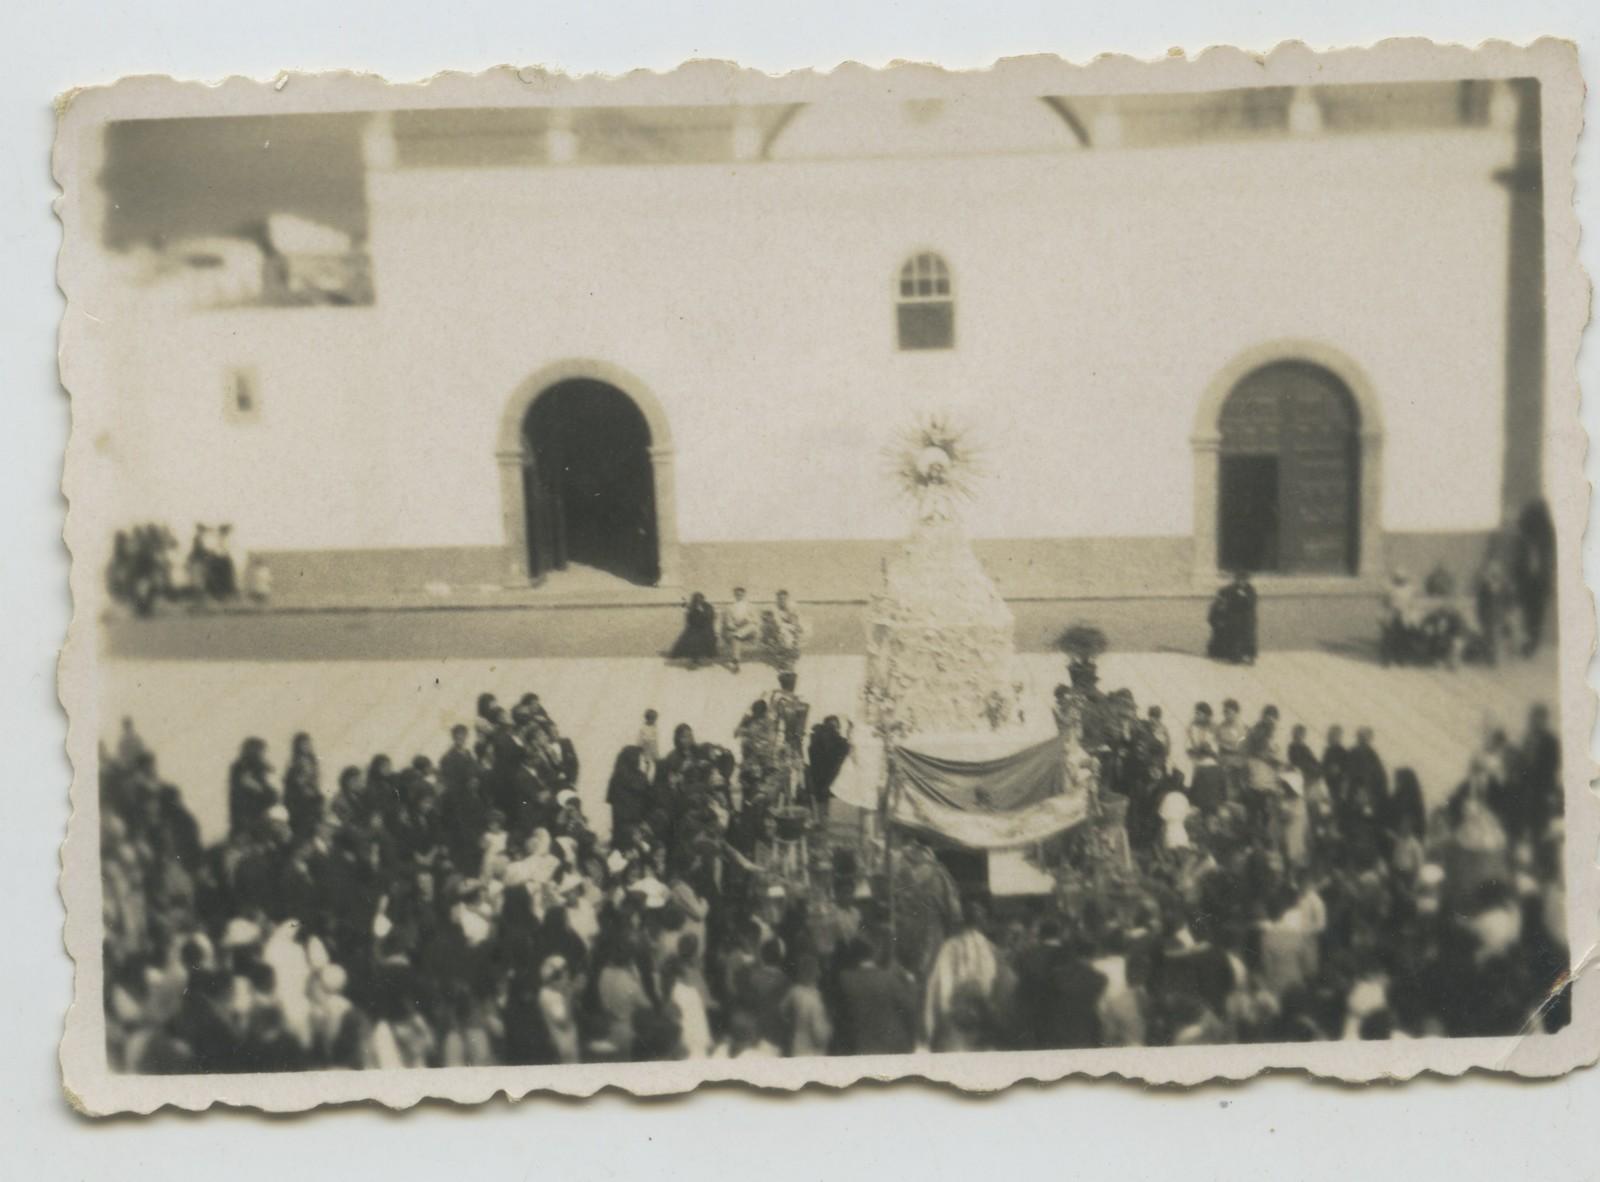 Procesión del Corpus Christi en la Iglesia de San Ginés VIII